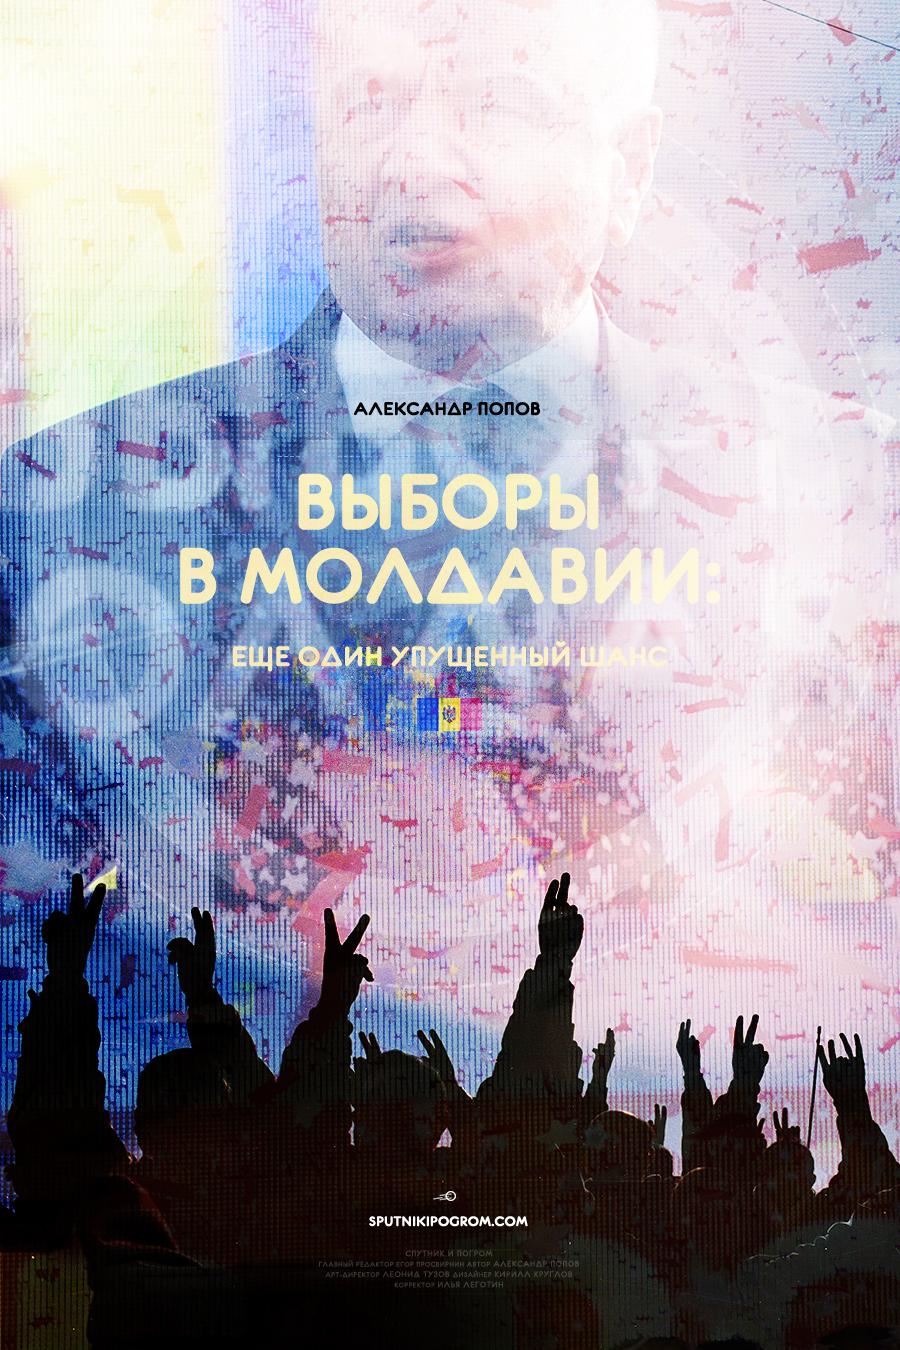 moldavia-elections